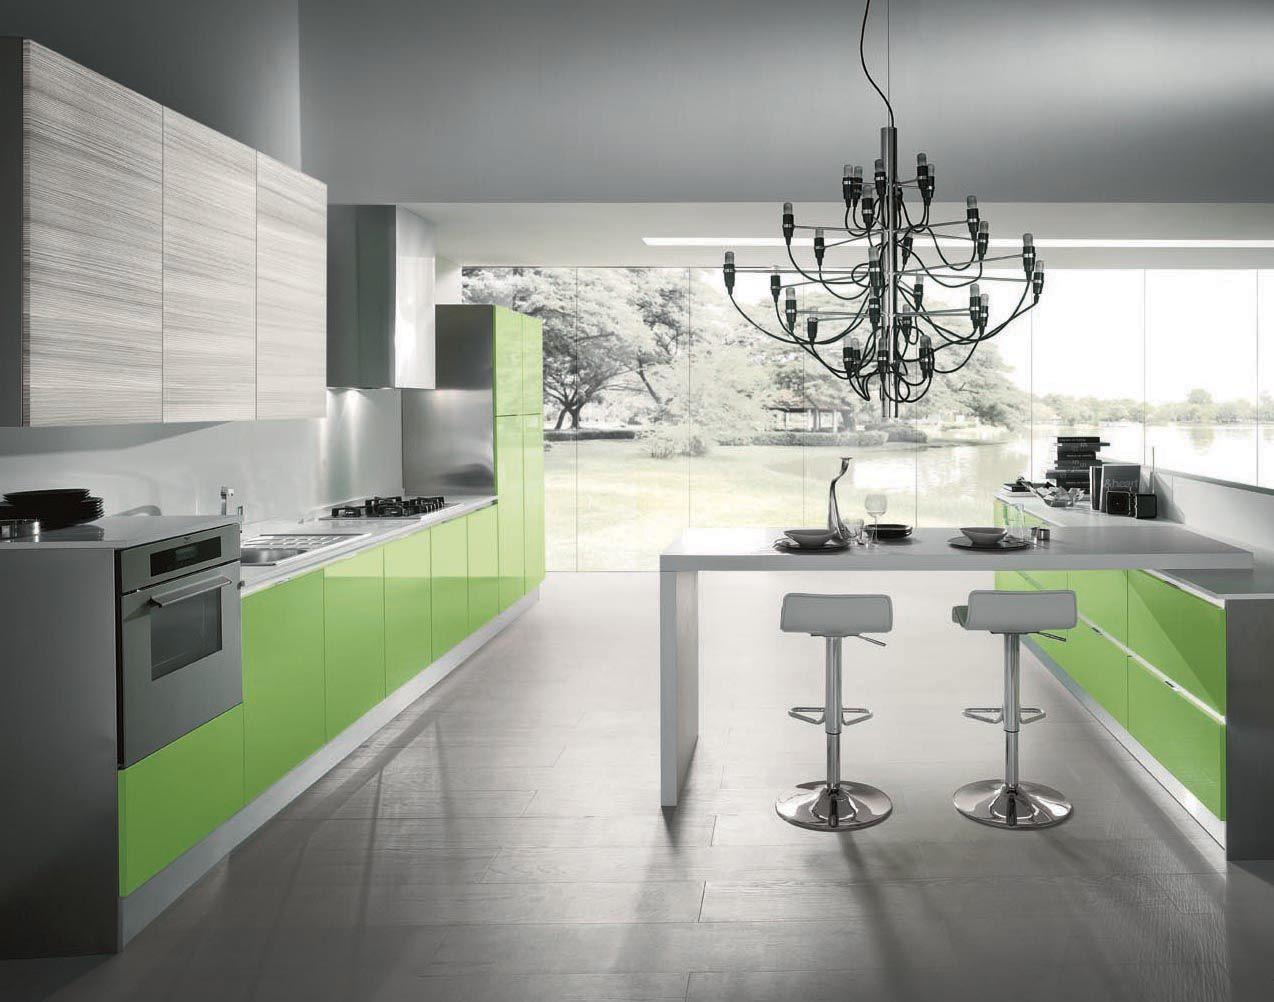 Cucina FLASH > #arredamento #verde #acido #design | Colore in cucina ...